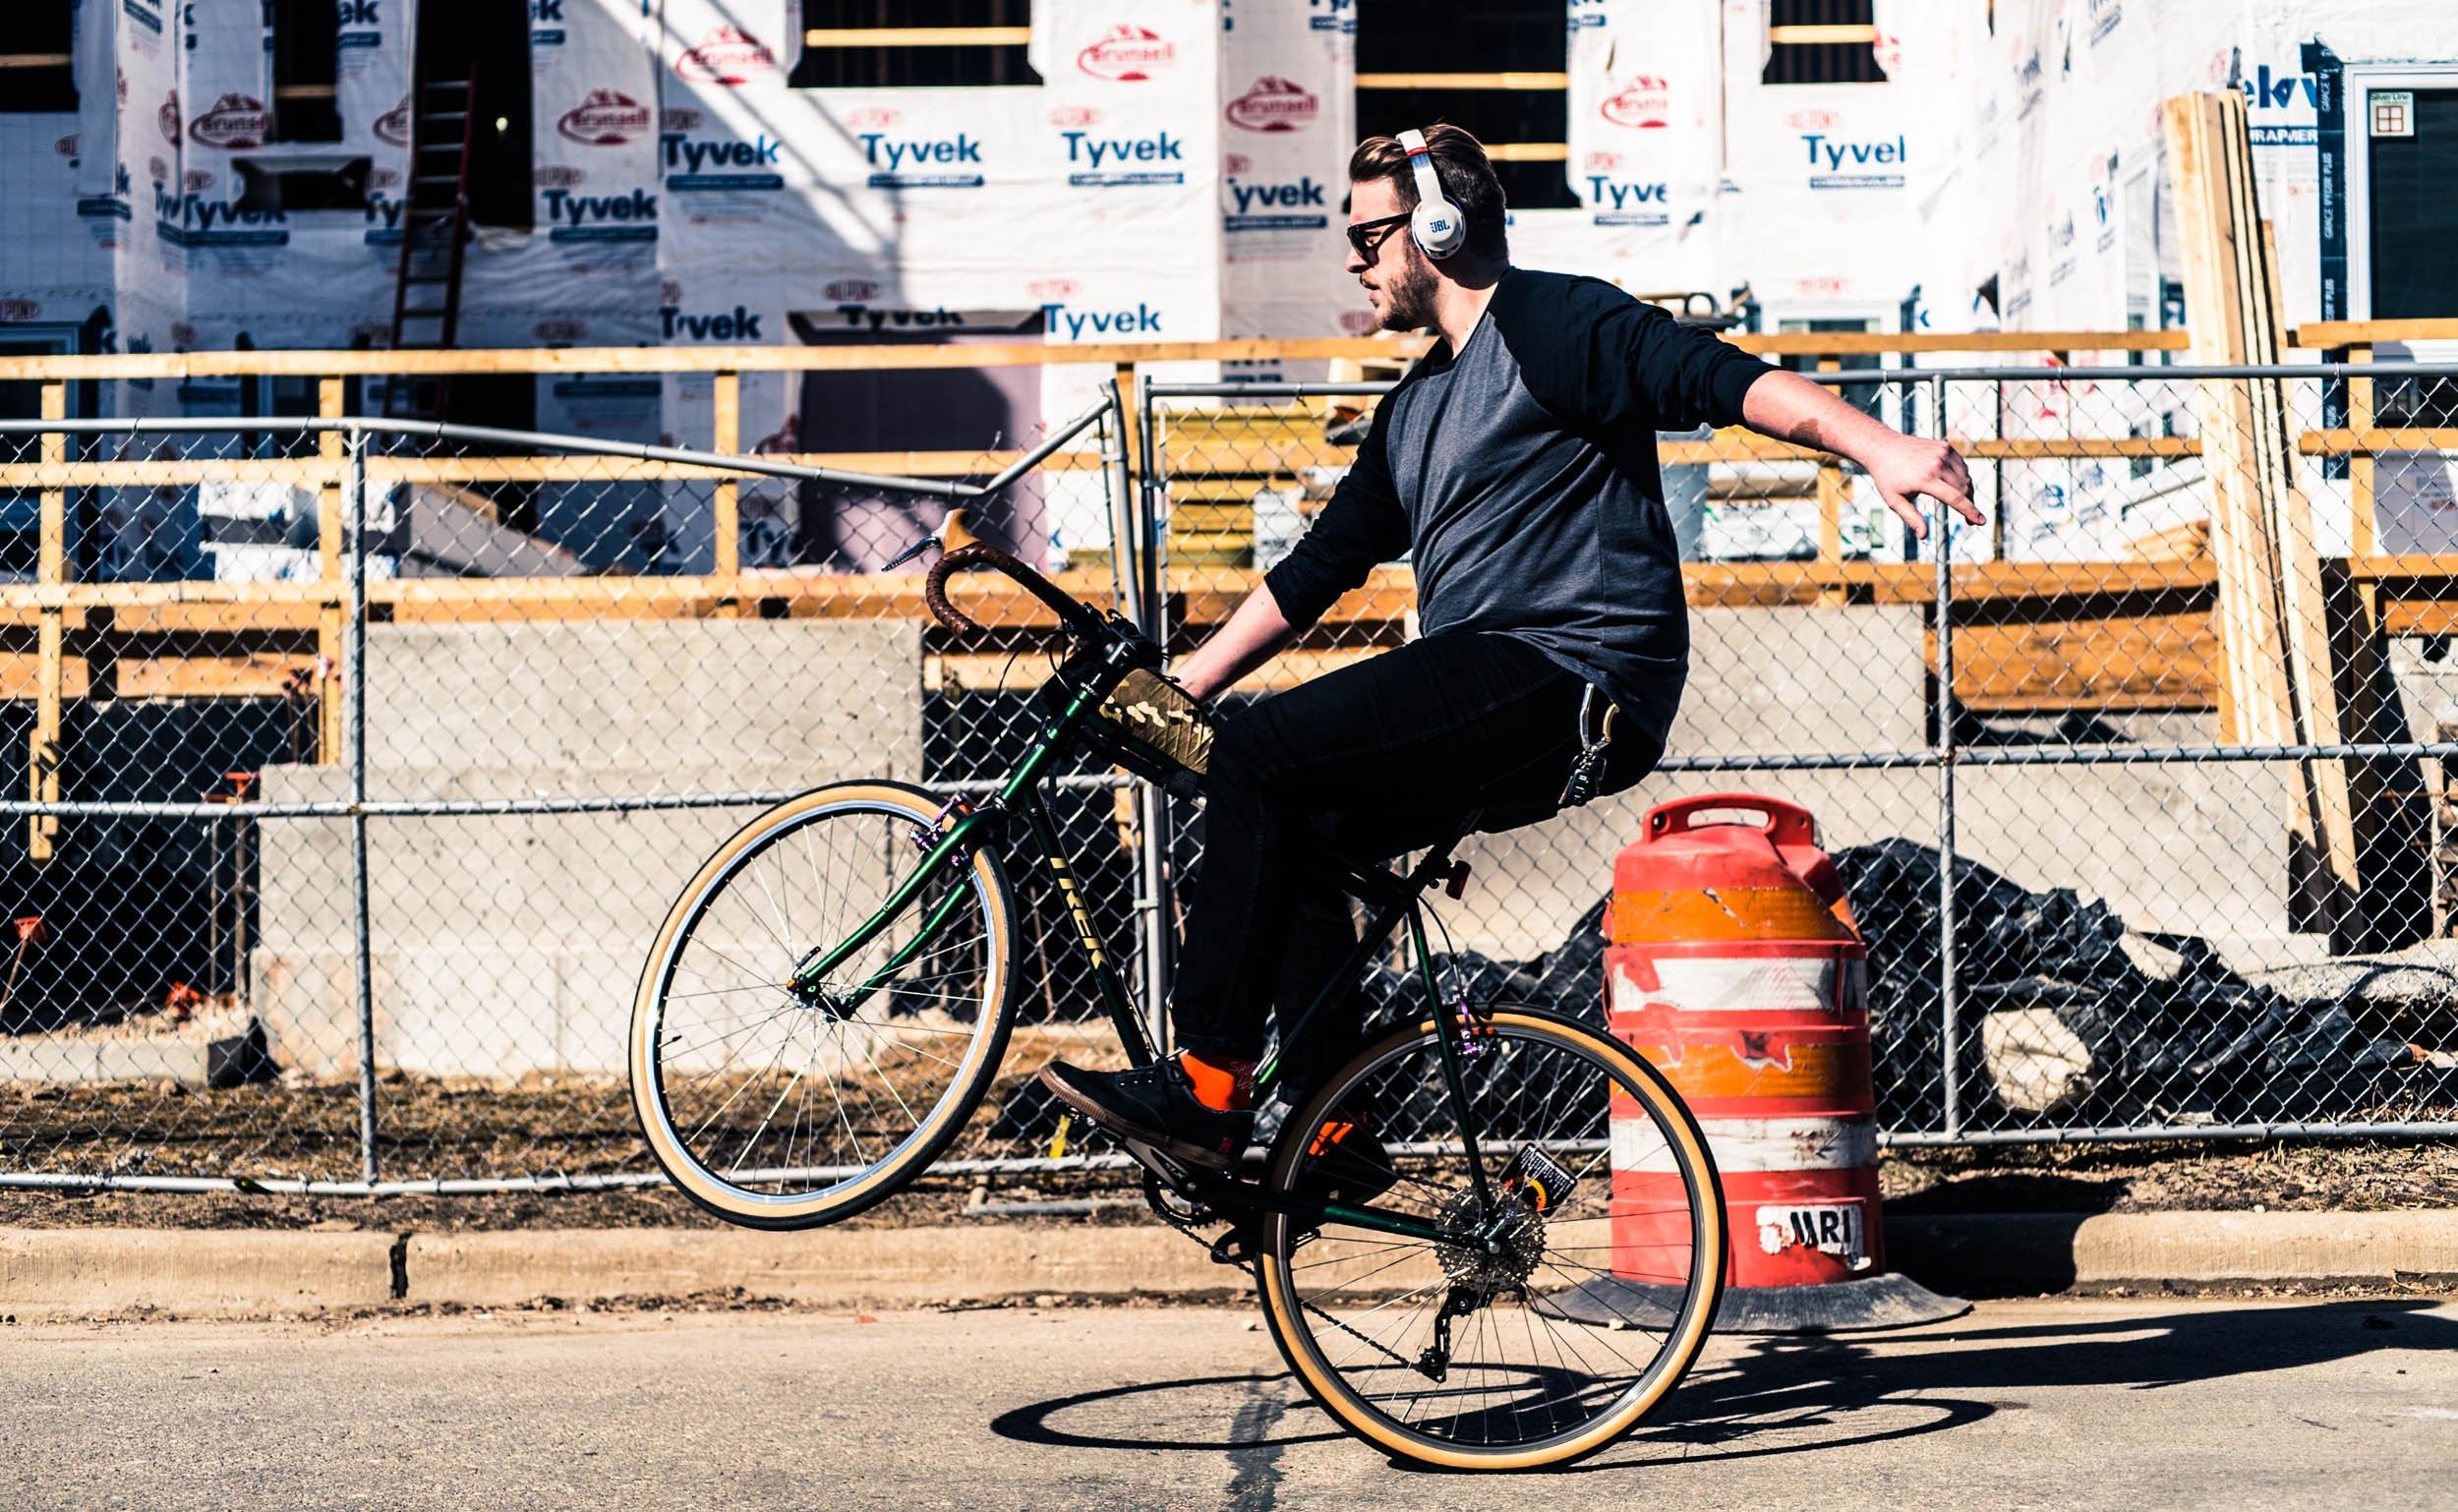 man riding on bicycle using headphones